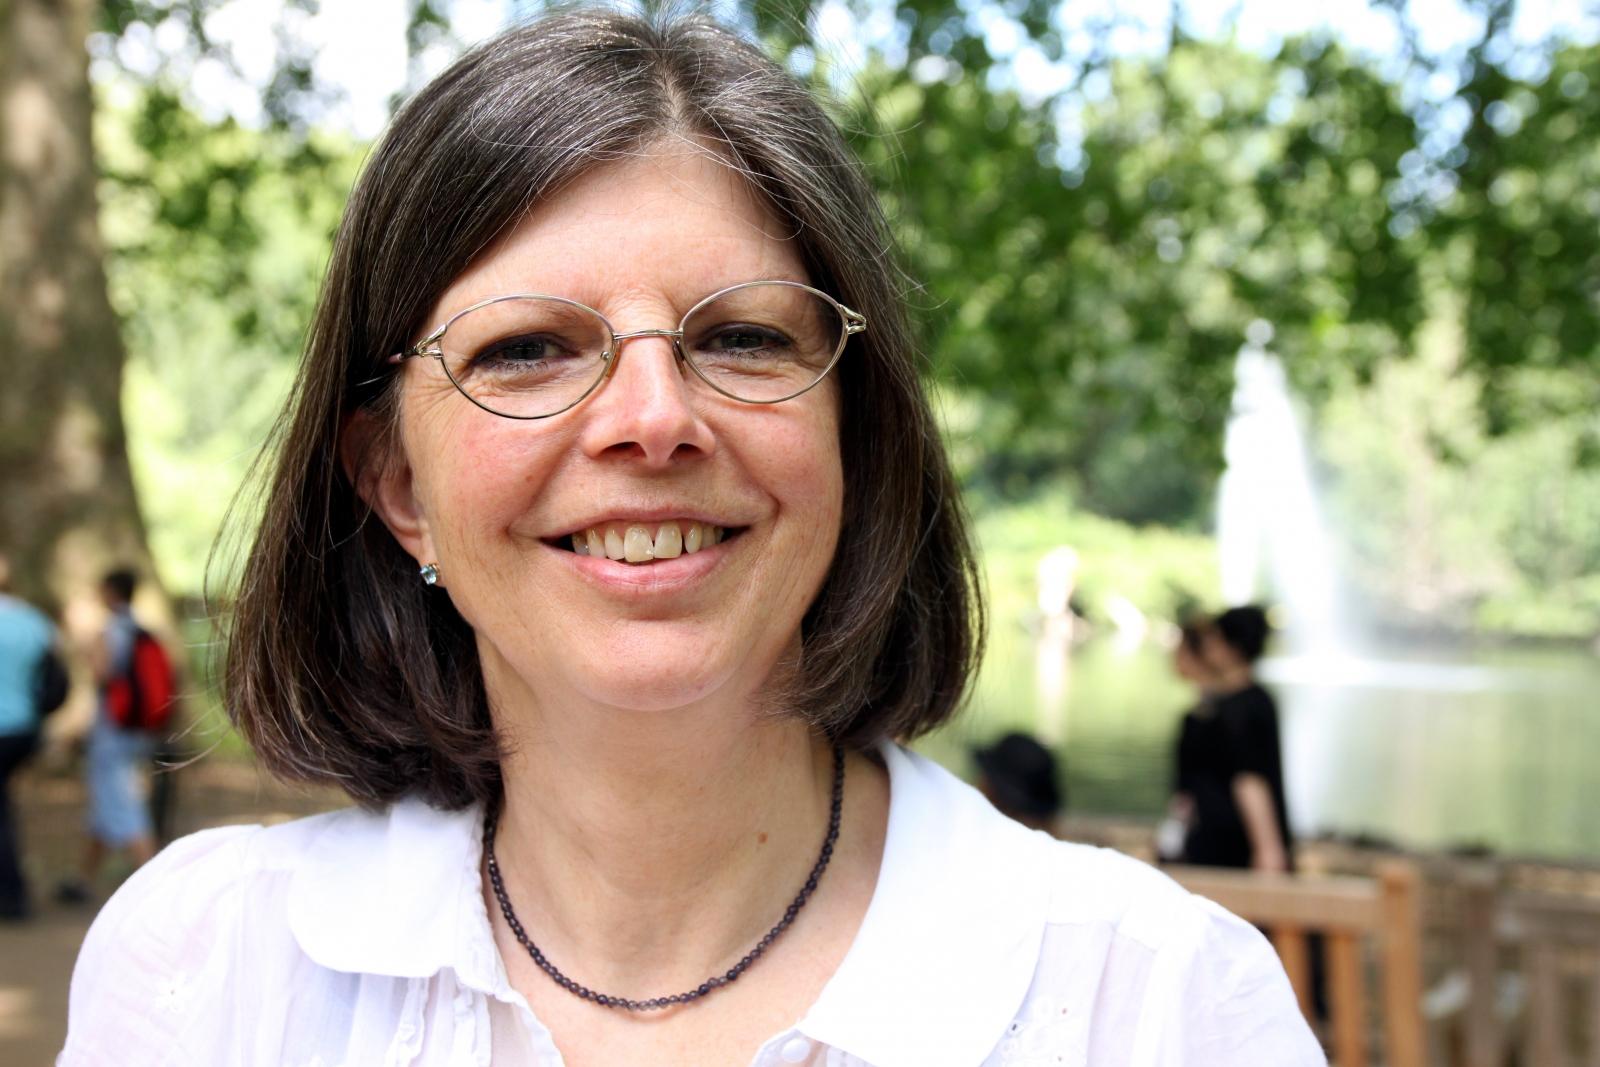 7/7 London bombings: Annie Thomas helped a community to mourn their friend - 7-7-memorial-10th-anniversary-annie-thomas